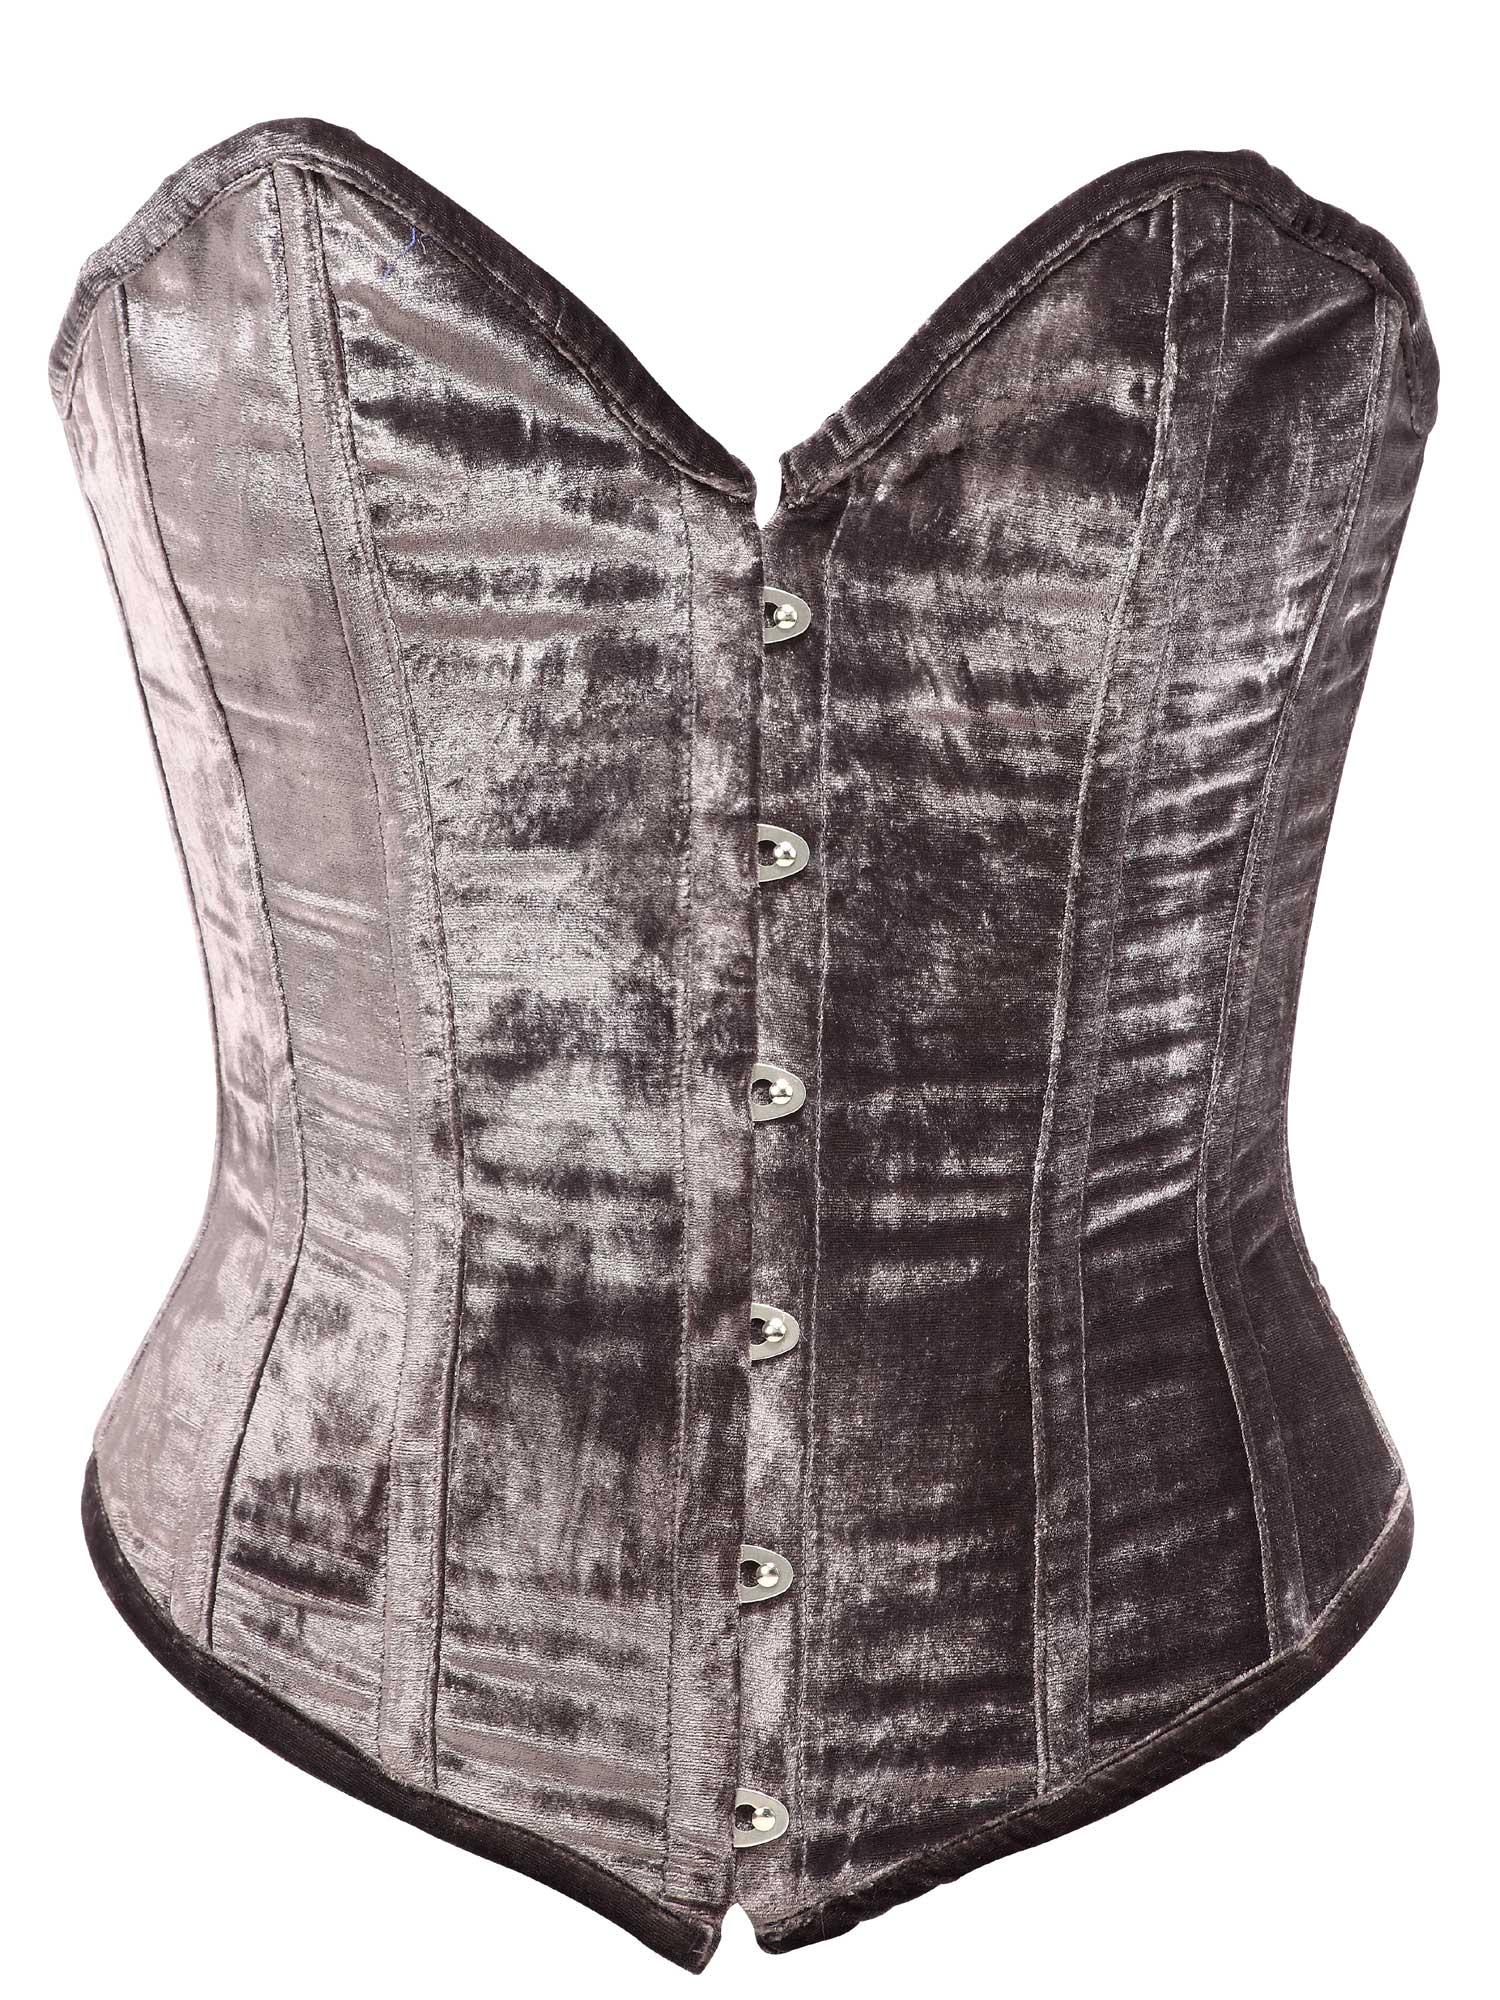 sand_color_velvet_fabric_steel_boning_corset_waist_cincher_bustier_bustiers_and_corsets_5.jpg